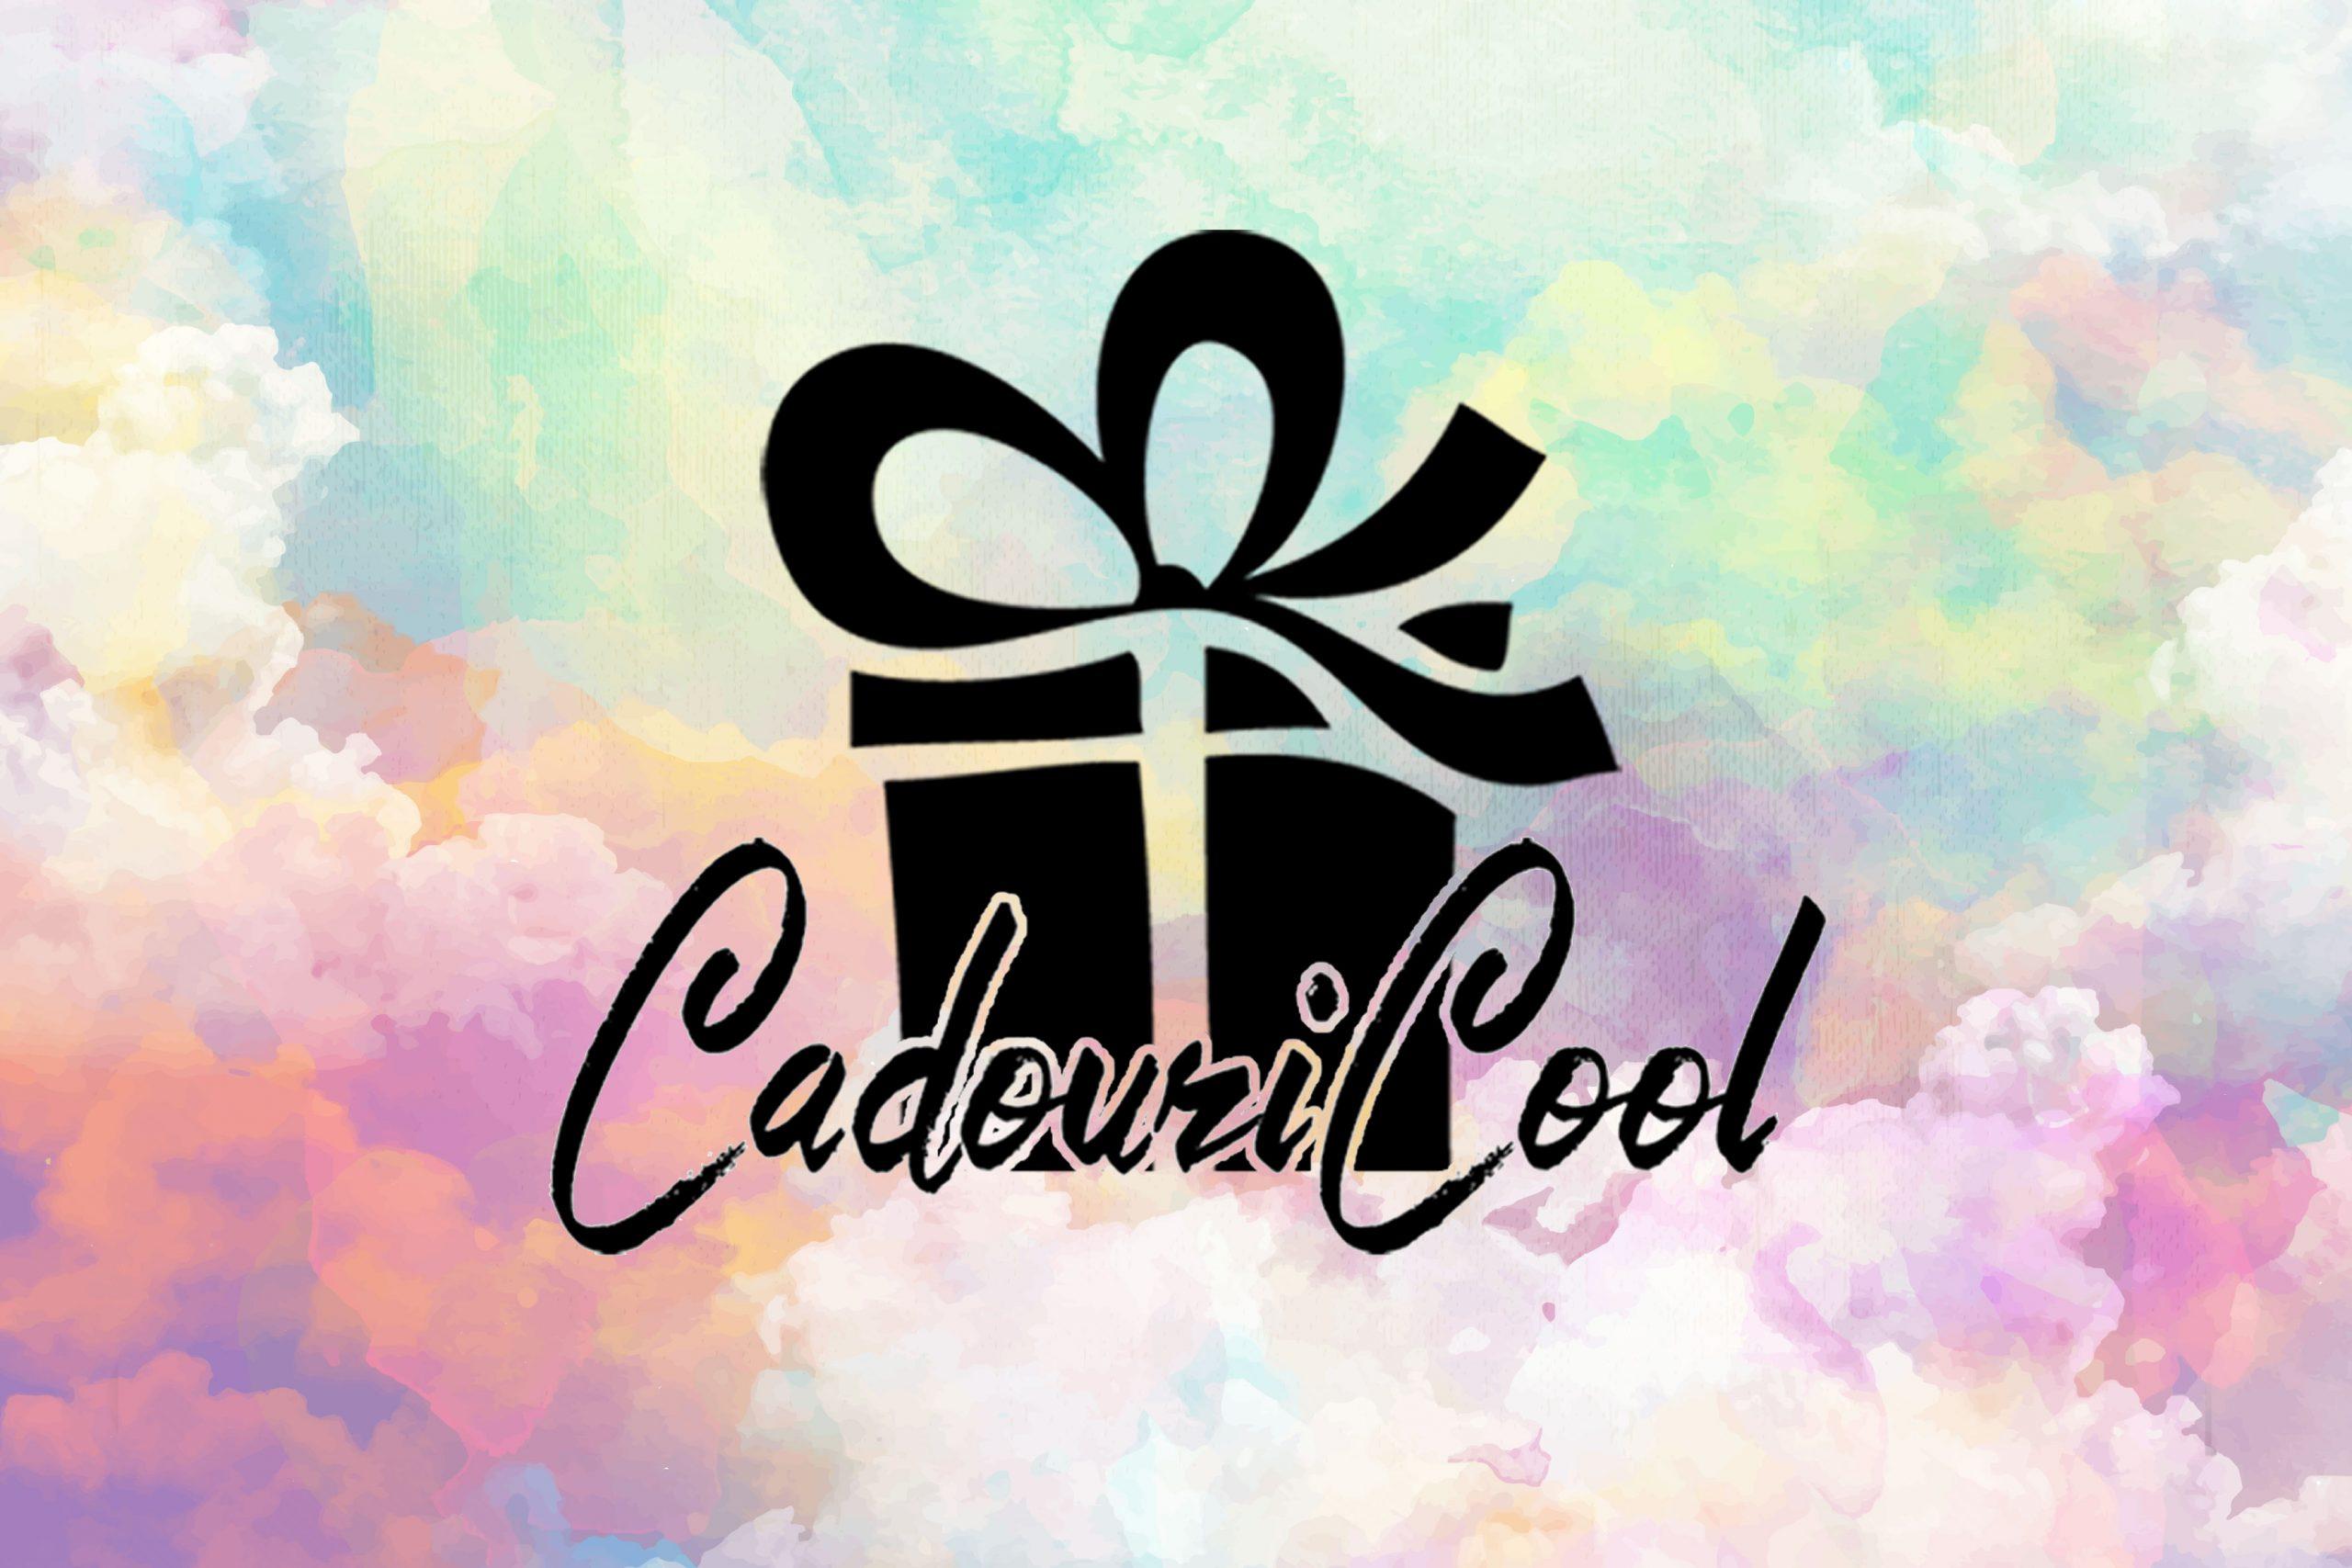 Cadouri Cool